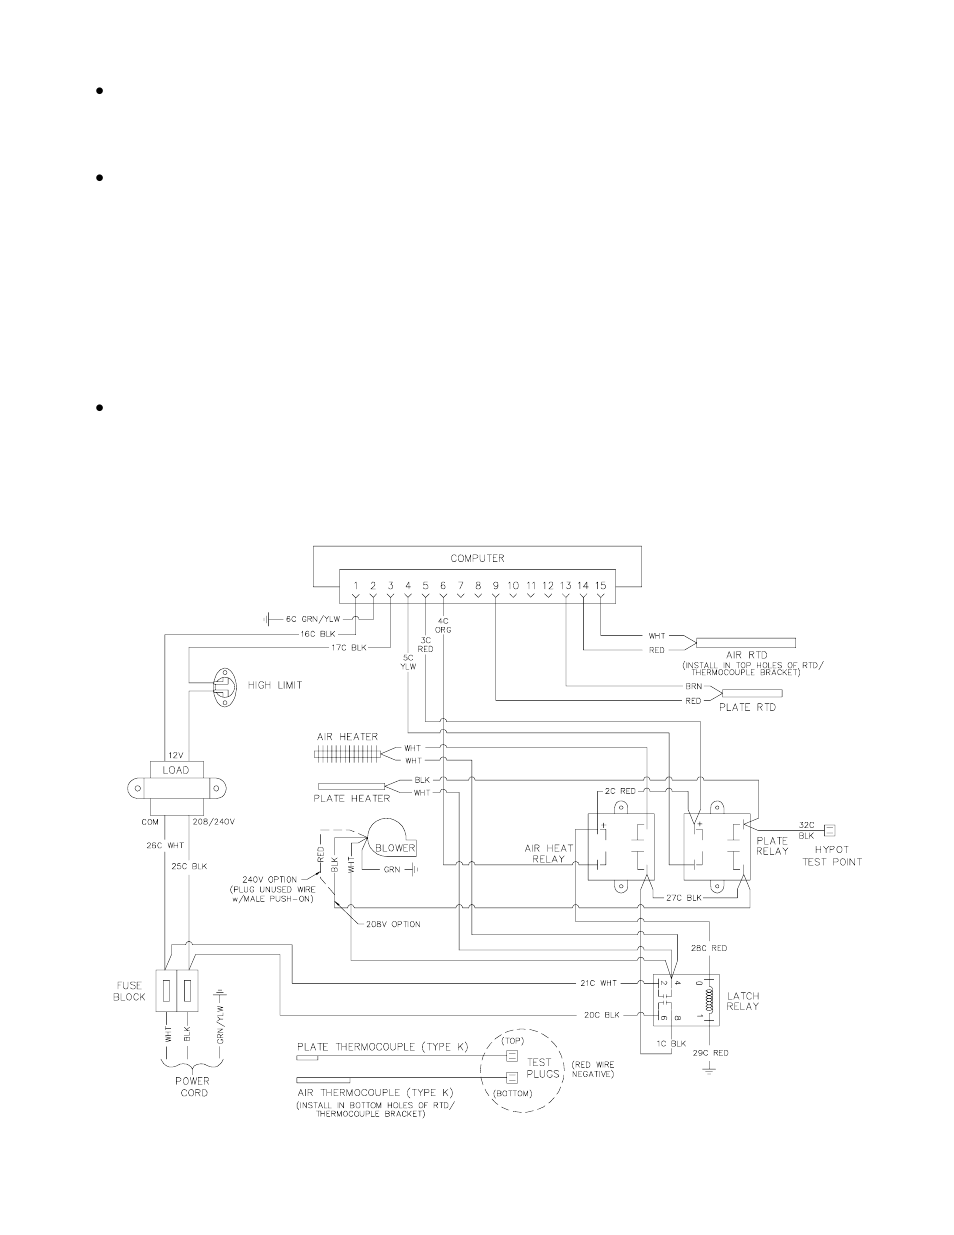 11 wiring diagram | Frymaster Heated Landing Zone HLZ 22 User Manual | Page  20 / 20